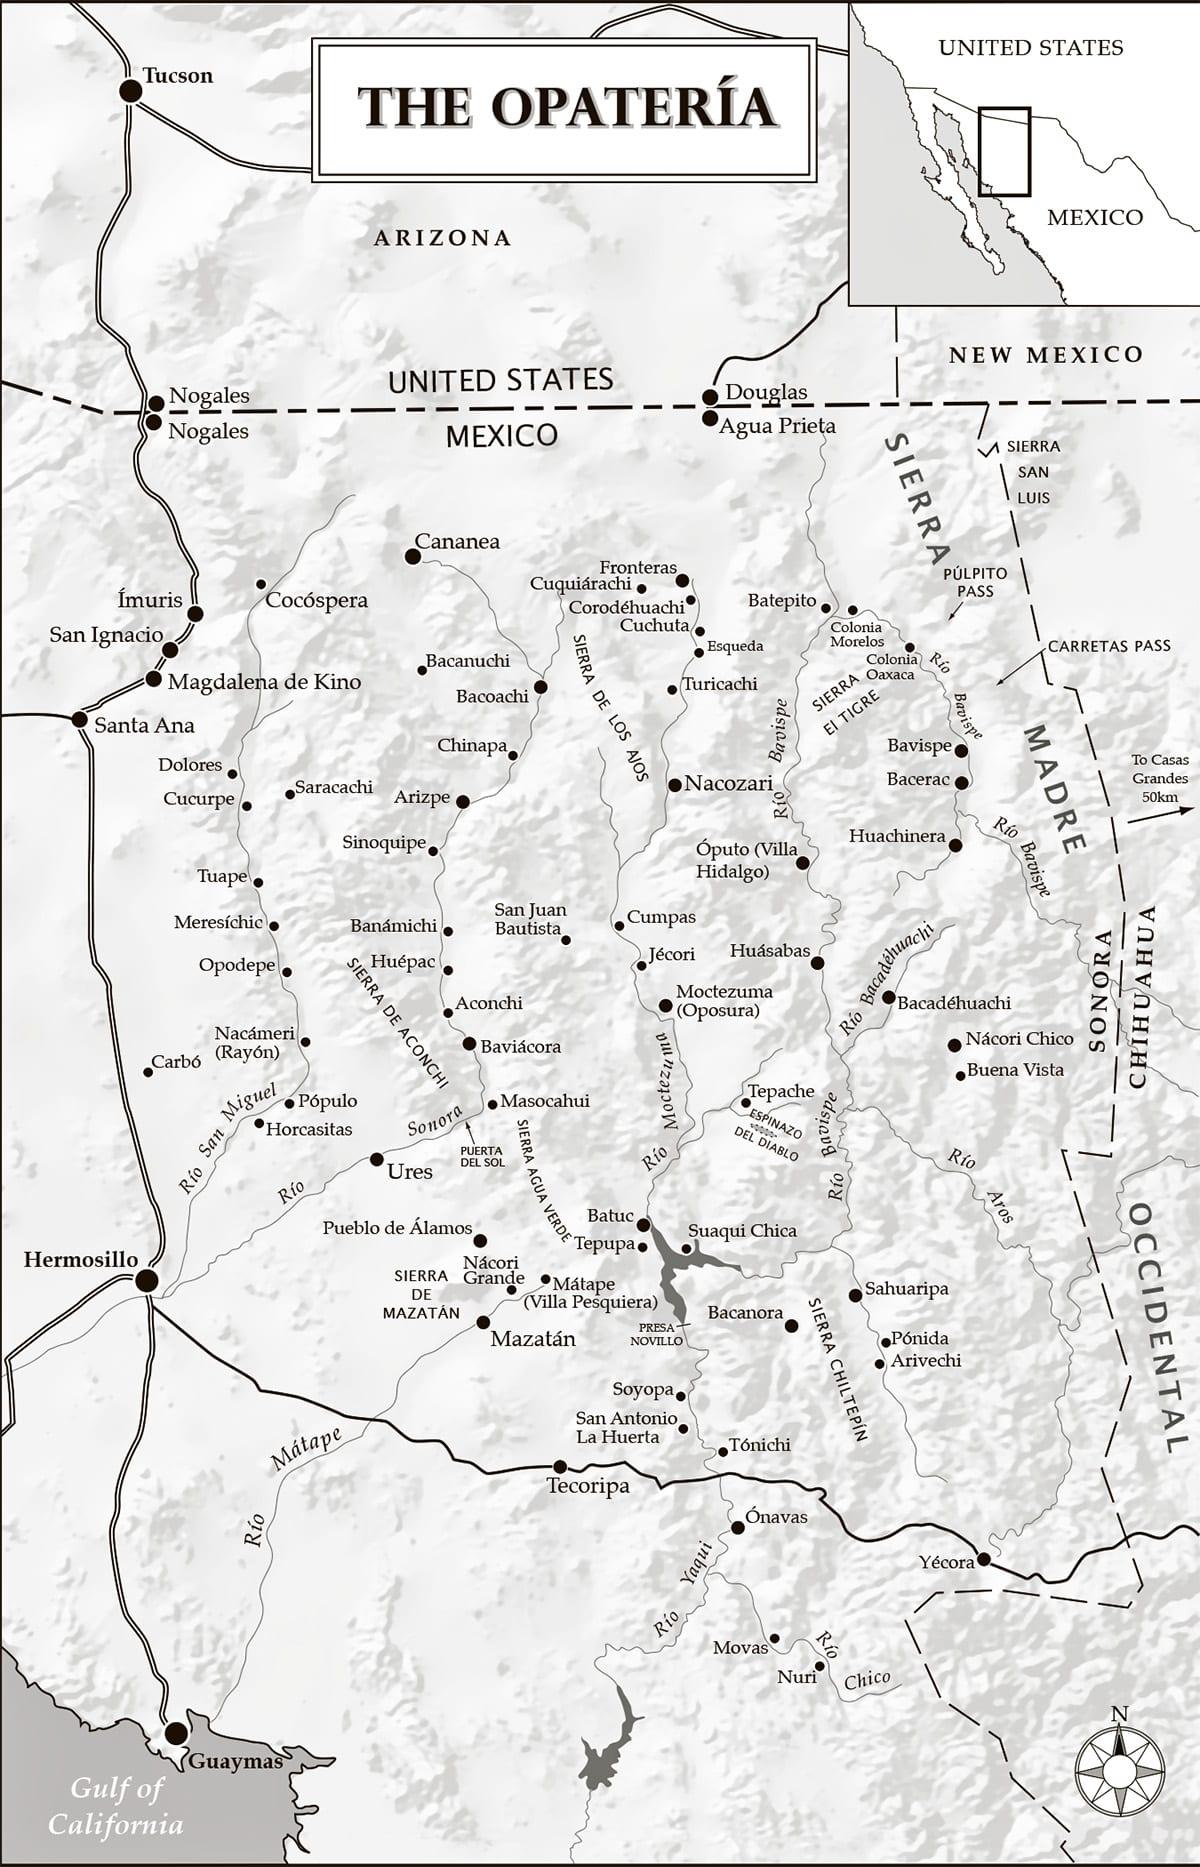 Map of the Opatería